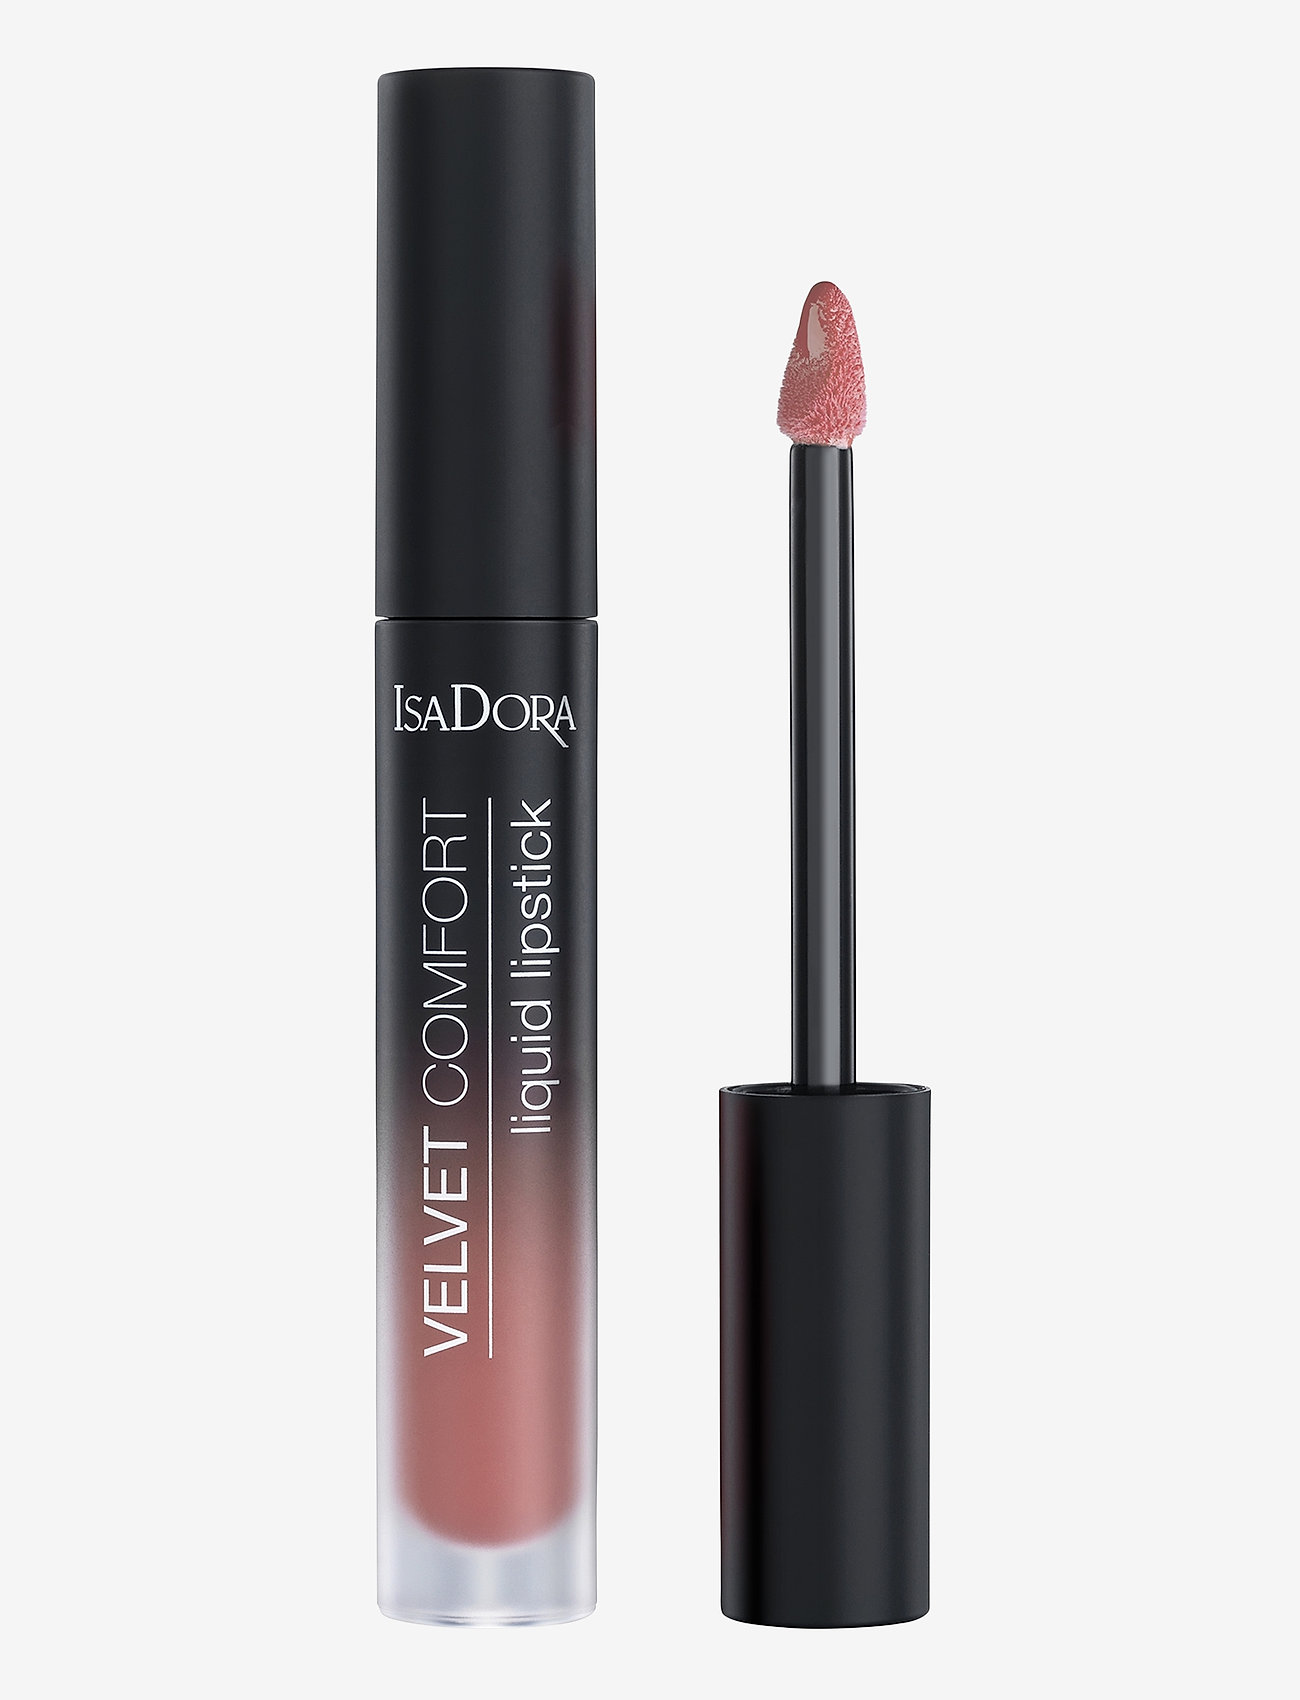 Isadora - Velvet Comfort Liquid Lipstick Coral Rose - liquid lipstick - coral rose - 1